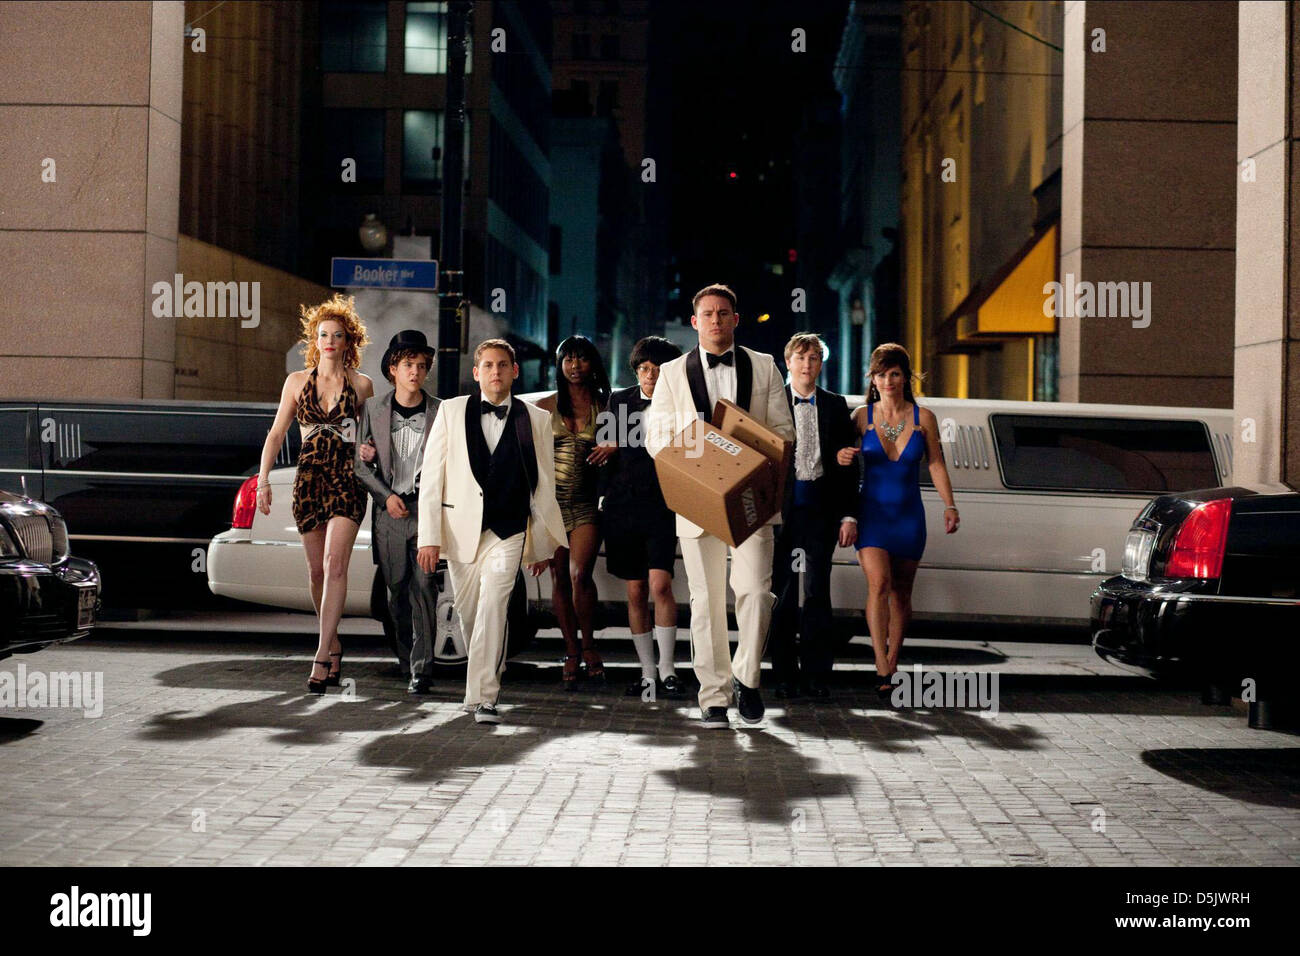 Jonah Hill Channing Tatum 21 Jump Street 2012 Stock Photo Alamy